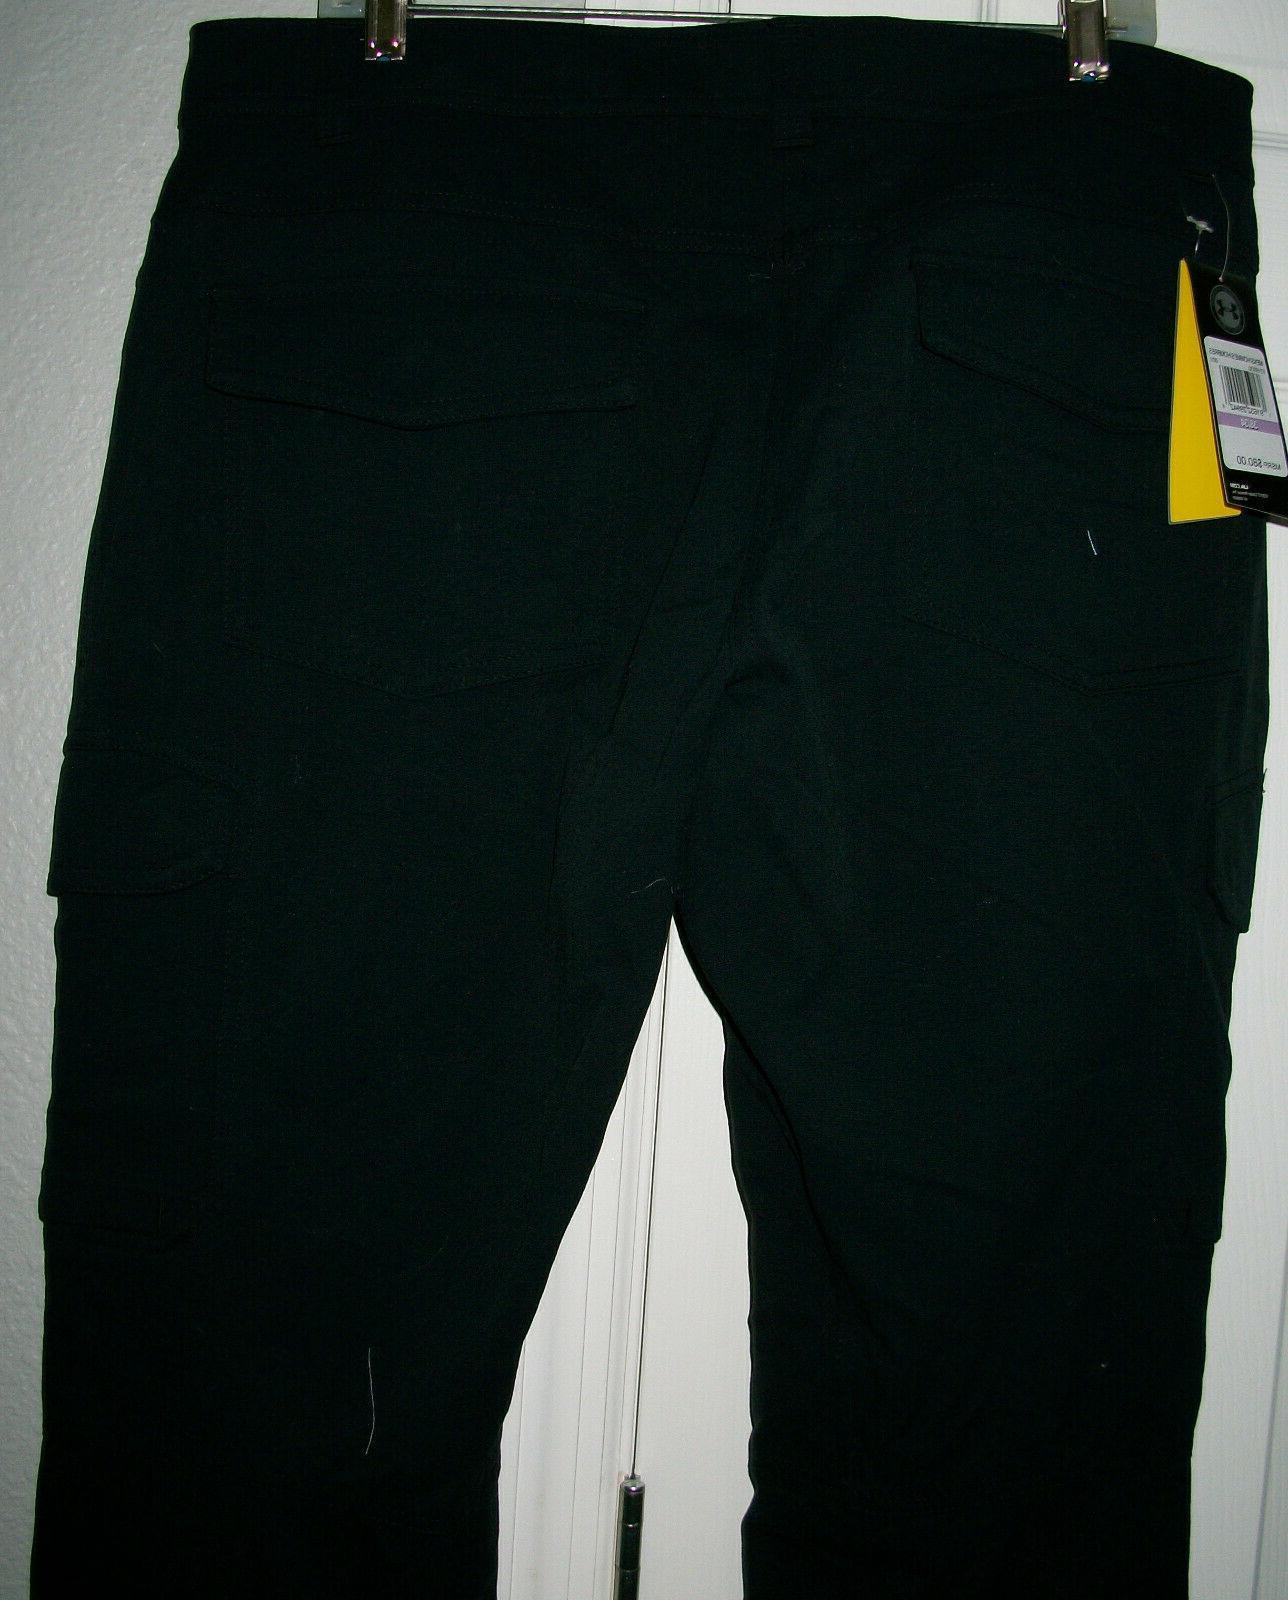 UNDER Water Resistant Pants/Jeans 34x30 $80